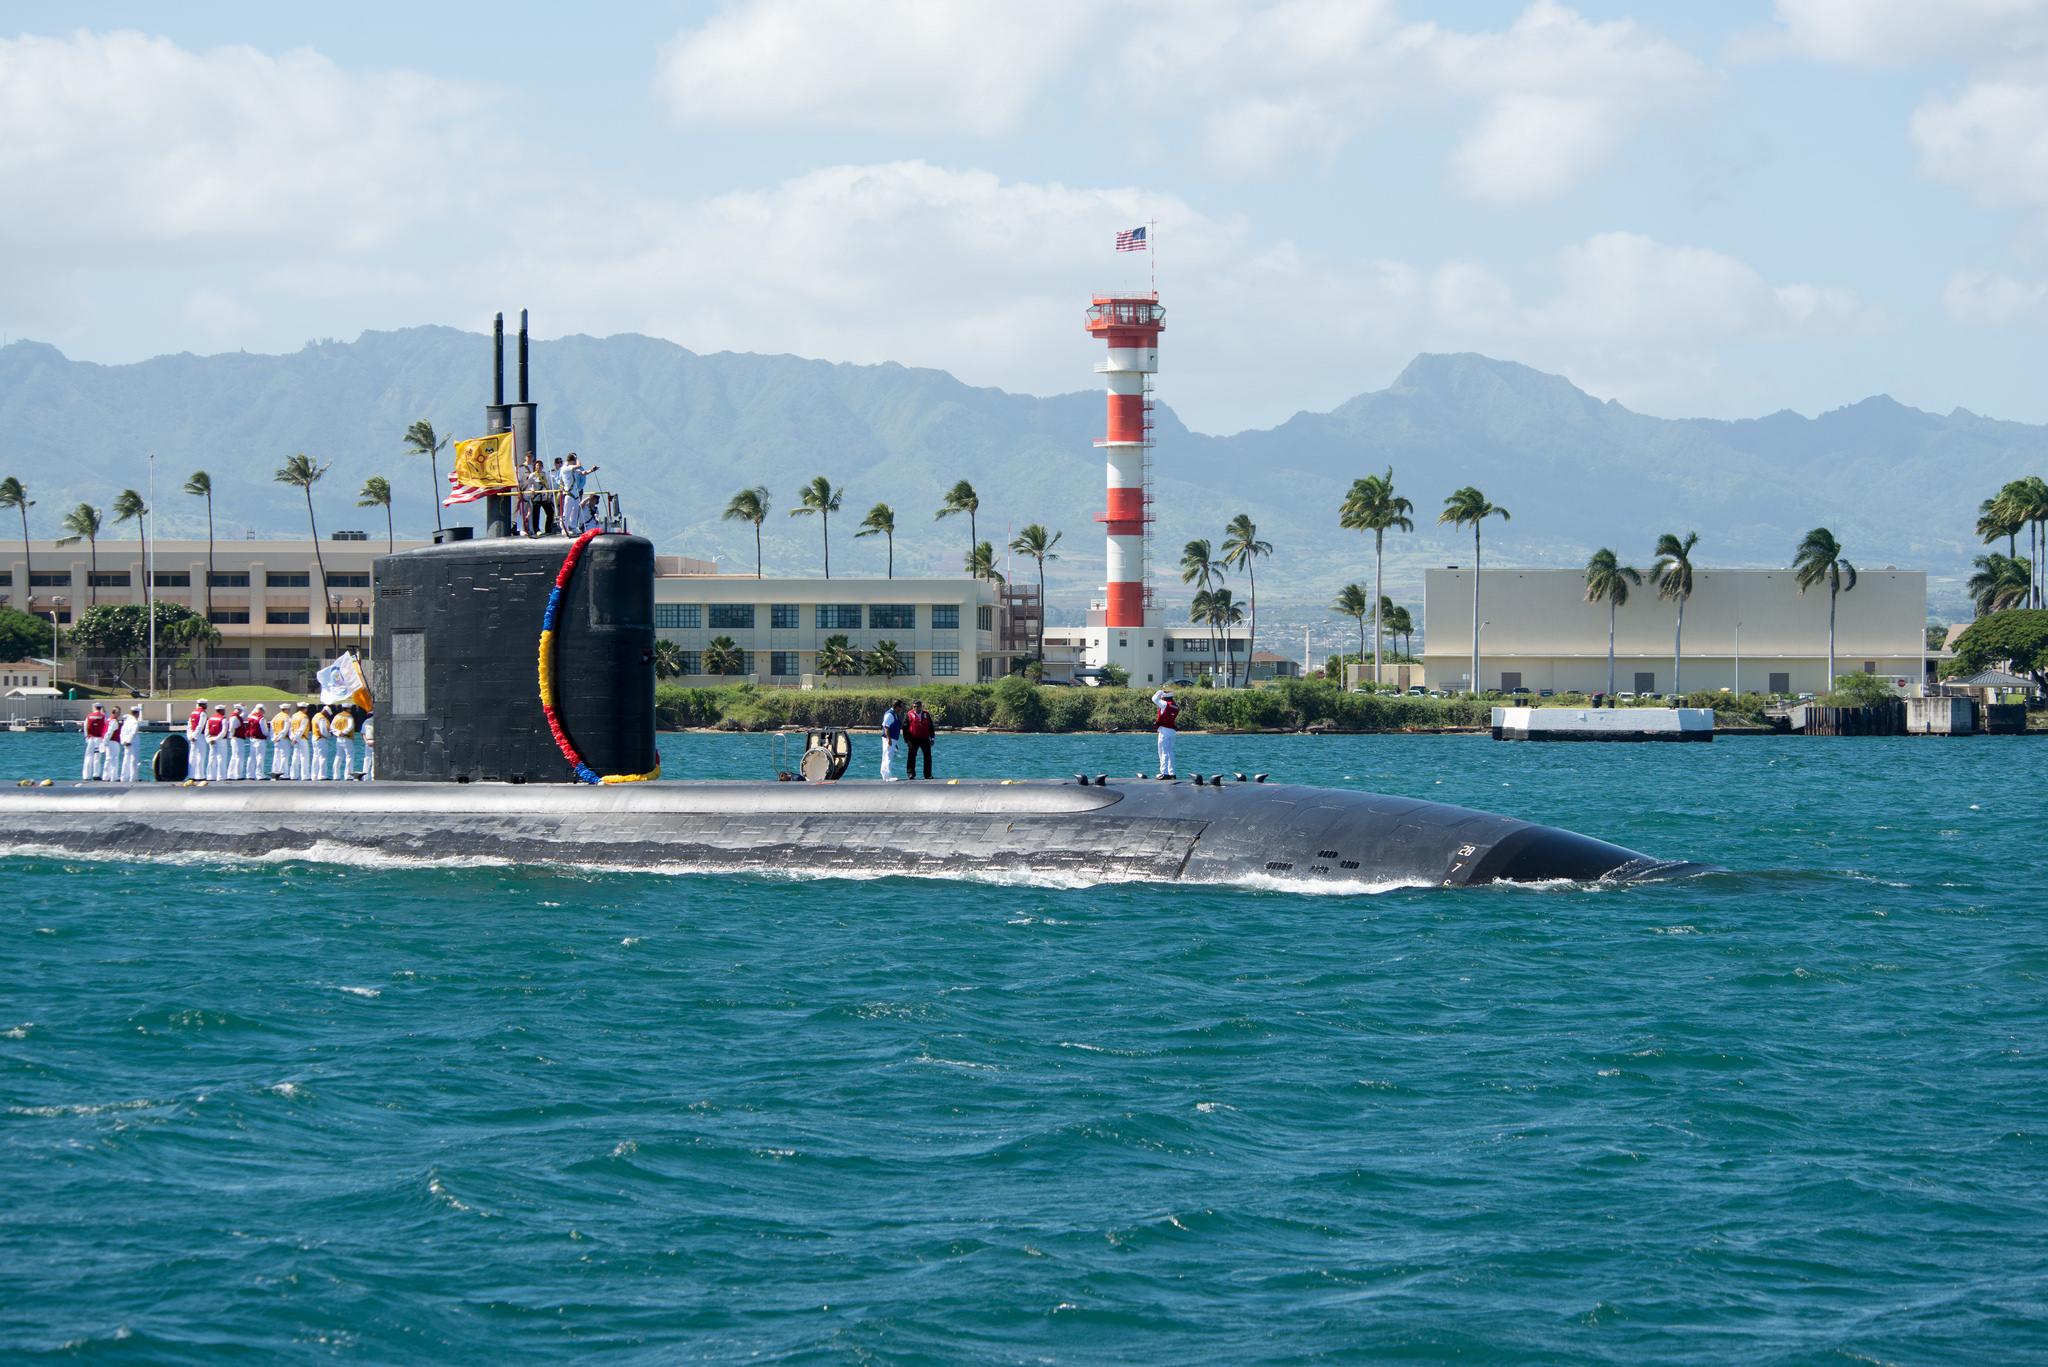 USS SANTA FE SSN-763 Einlaufen Pearl Harbor am 28.10.2015 Bild: U.S. Navy